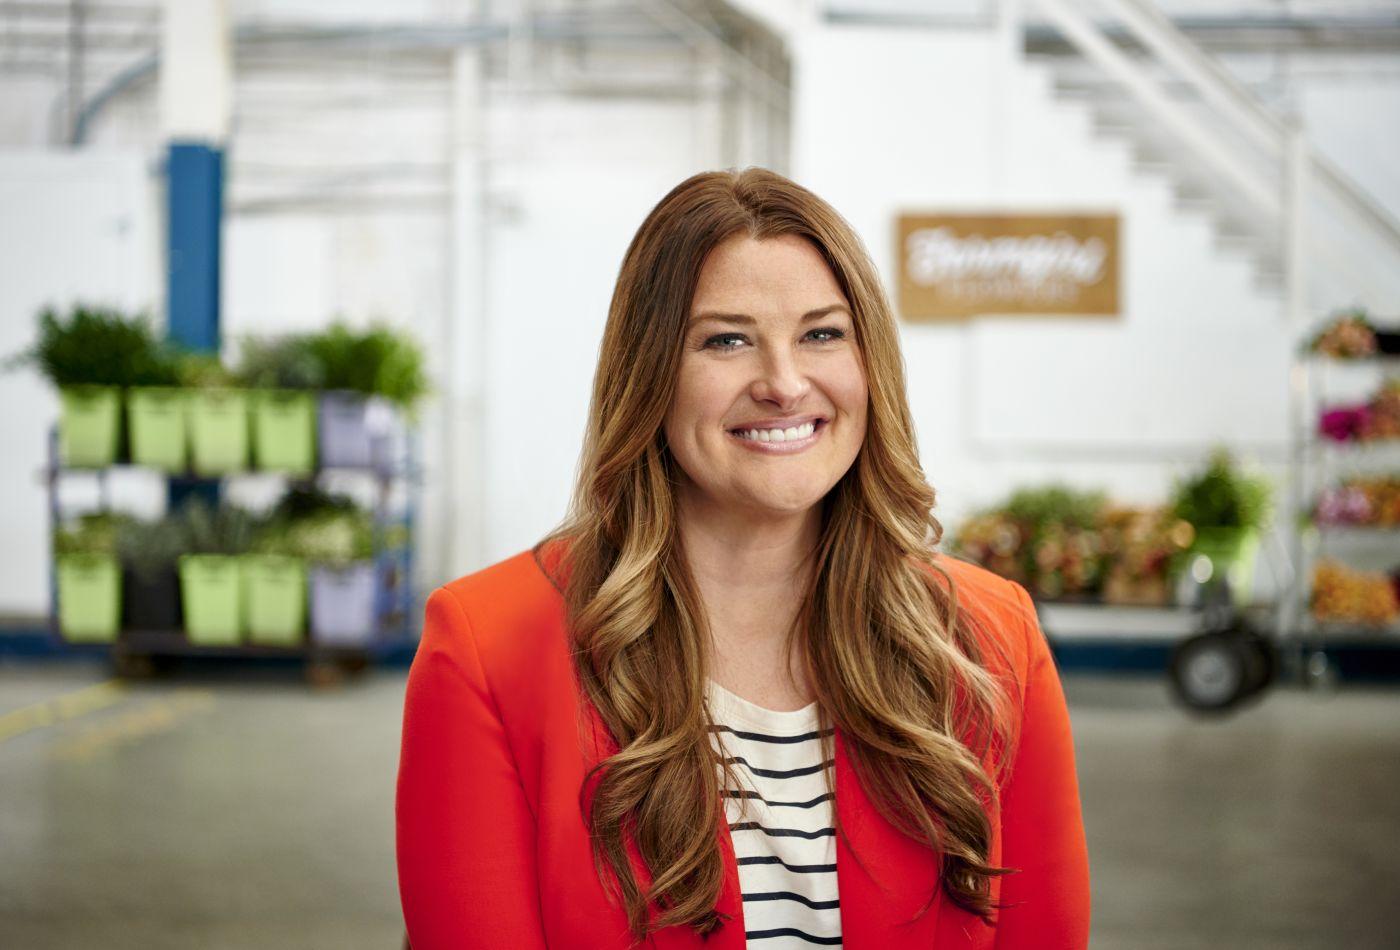 Farmgirl Flowers CEO, Christina Stembel - Giám đốc điều hành Farmgirl Flower. Nguồn: Internet